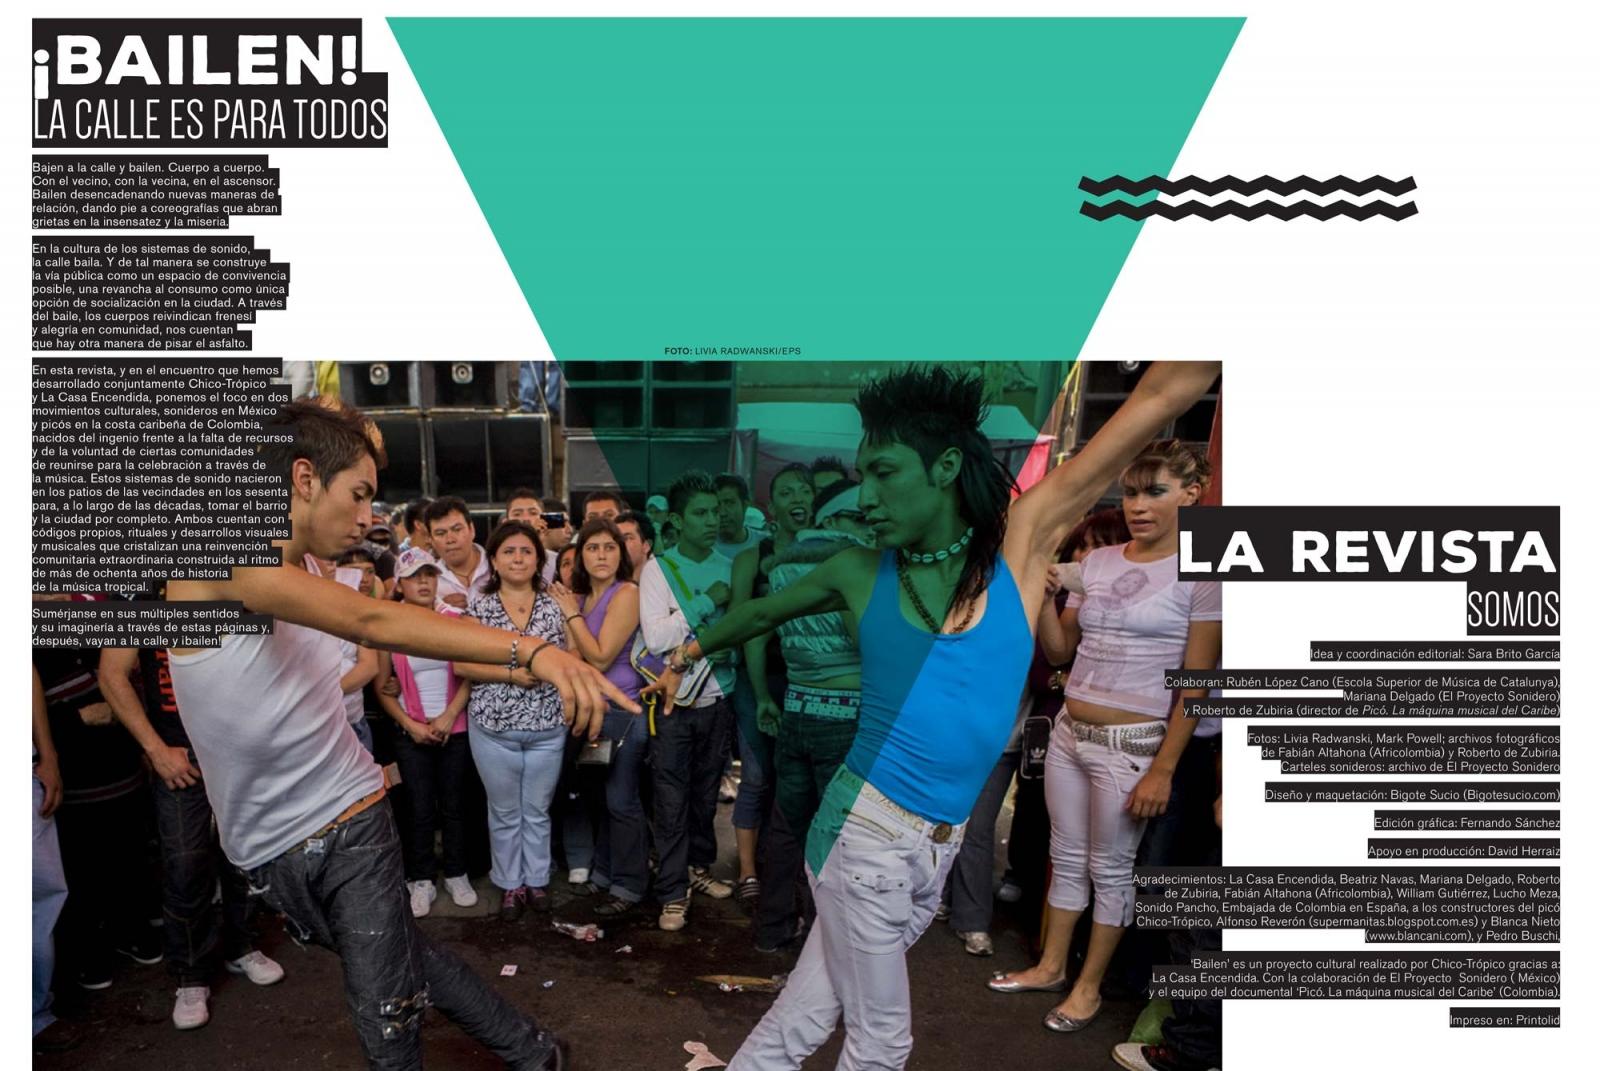 Art and Documentary Photography - Loading Bailen_espana_sonidero_4_depdf.jpg